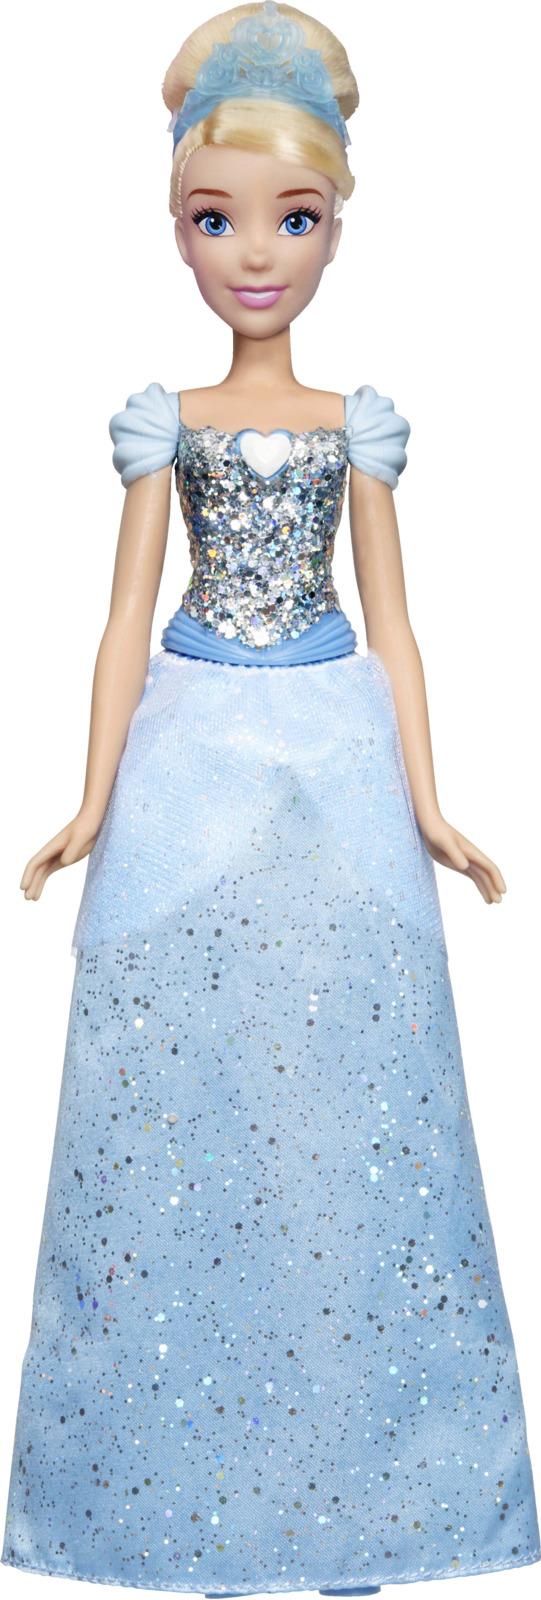 Кукла Disney Princess Classic Fashion Doll Asst, E4020EU4 рюкзак для ноутбука 17 asus artemis bp270 нейлон резина серый 90xb0410 bbp010